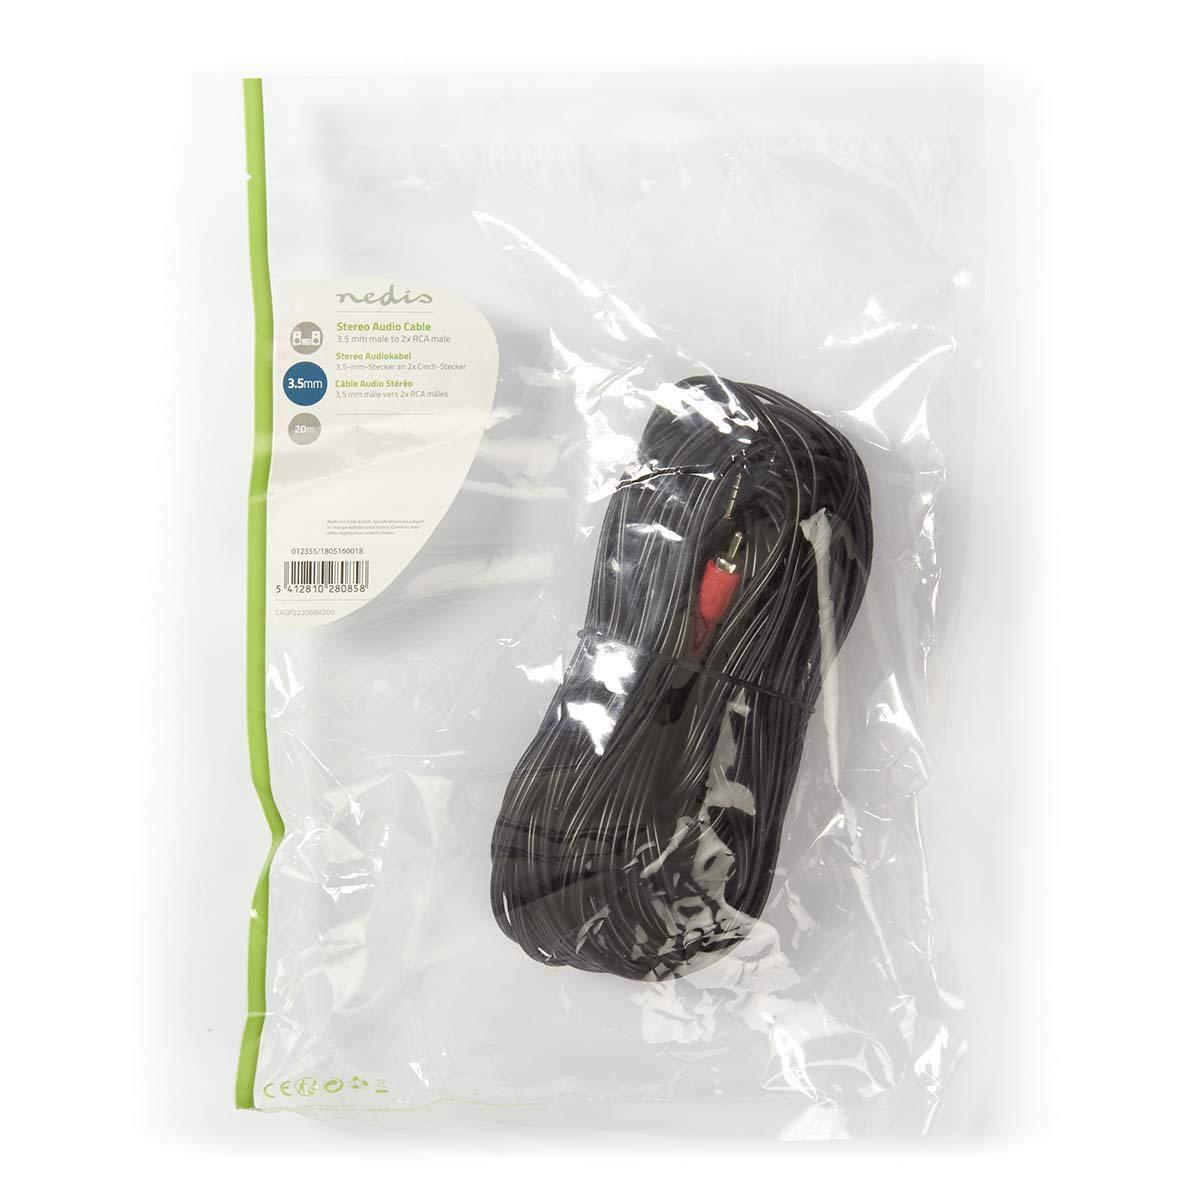 Cable de audio conector est/éreo de 3,5mm Macho a 2 conectores RCA Phono Macho Valueline VLAP22200B100 Valueline VLAP22200B100 10m